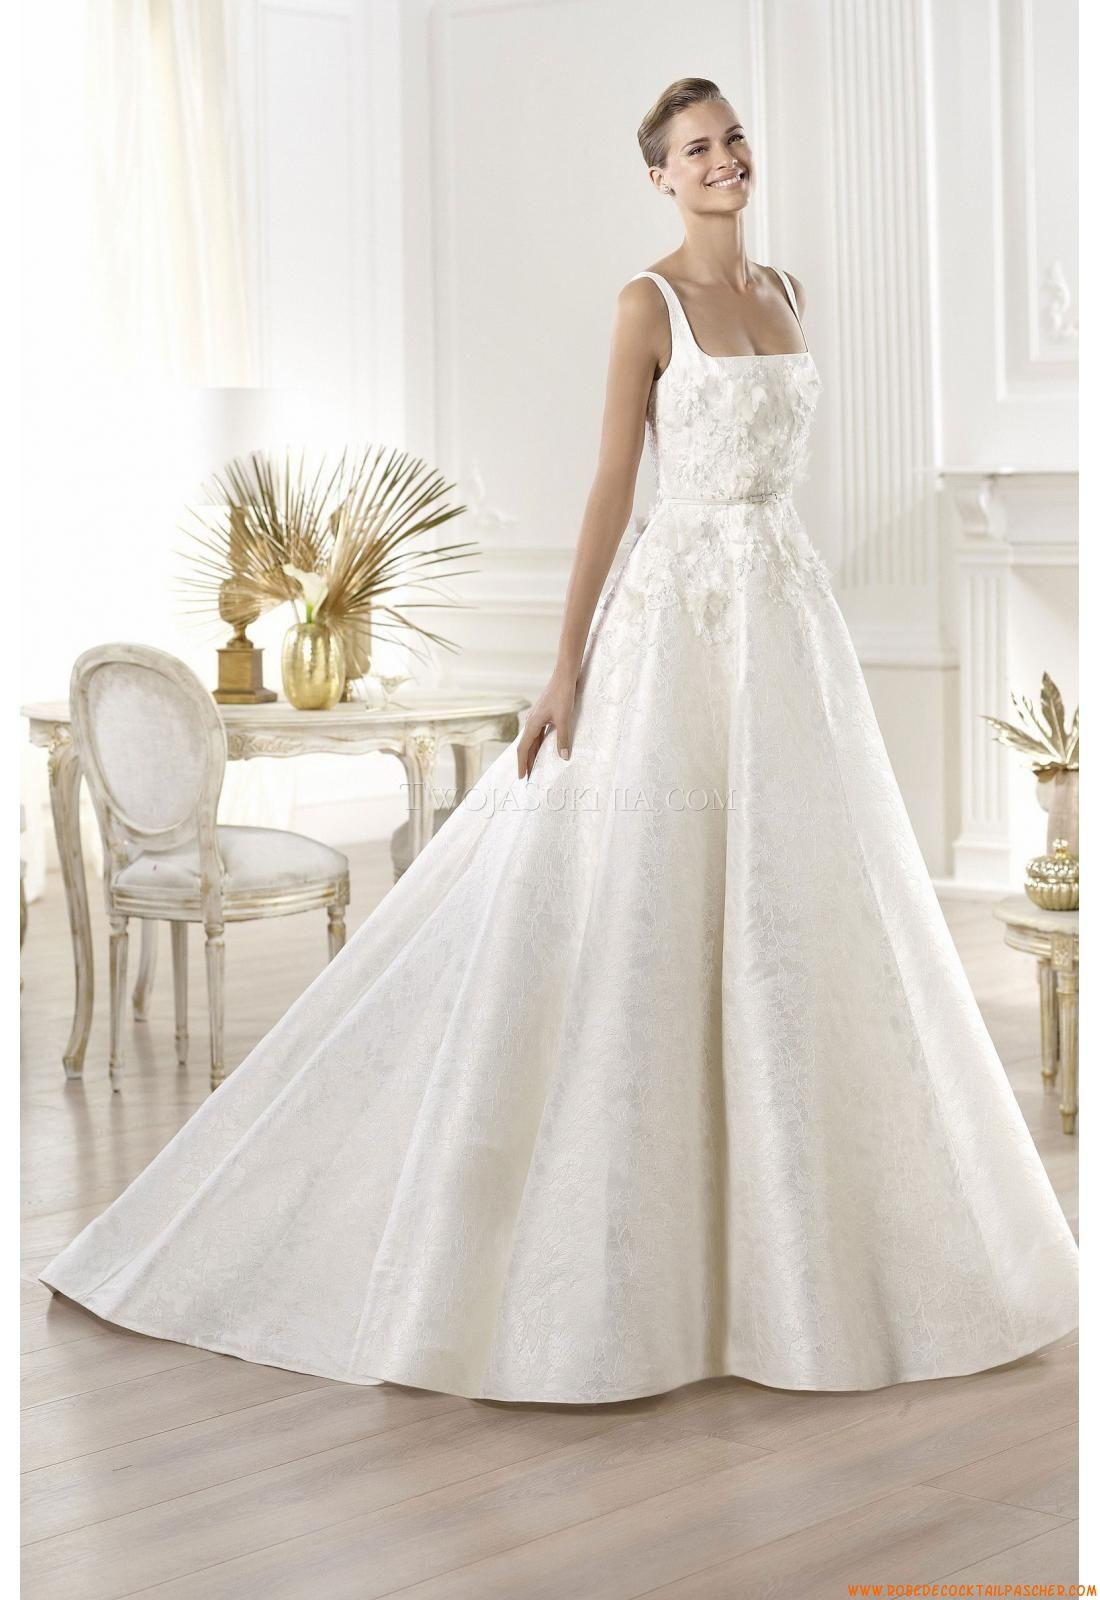 Robe de mariee elie saab 2014